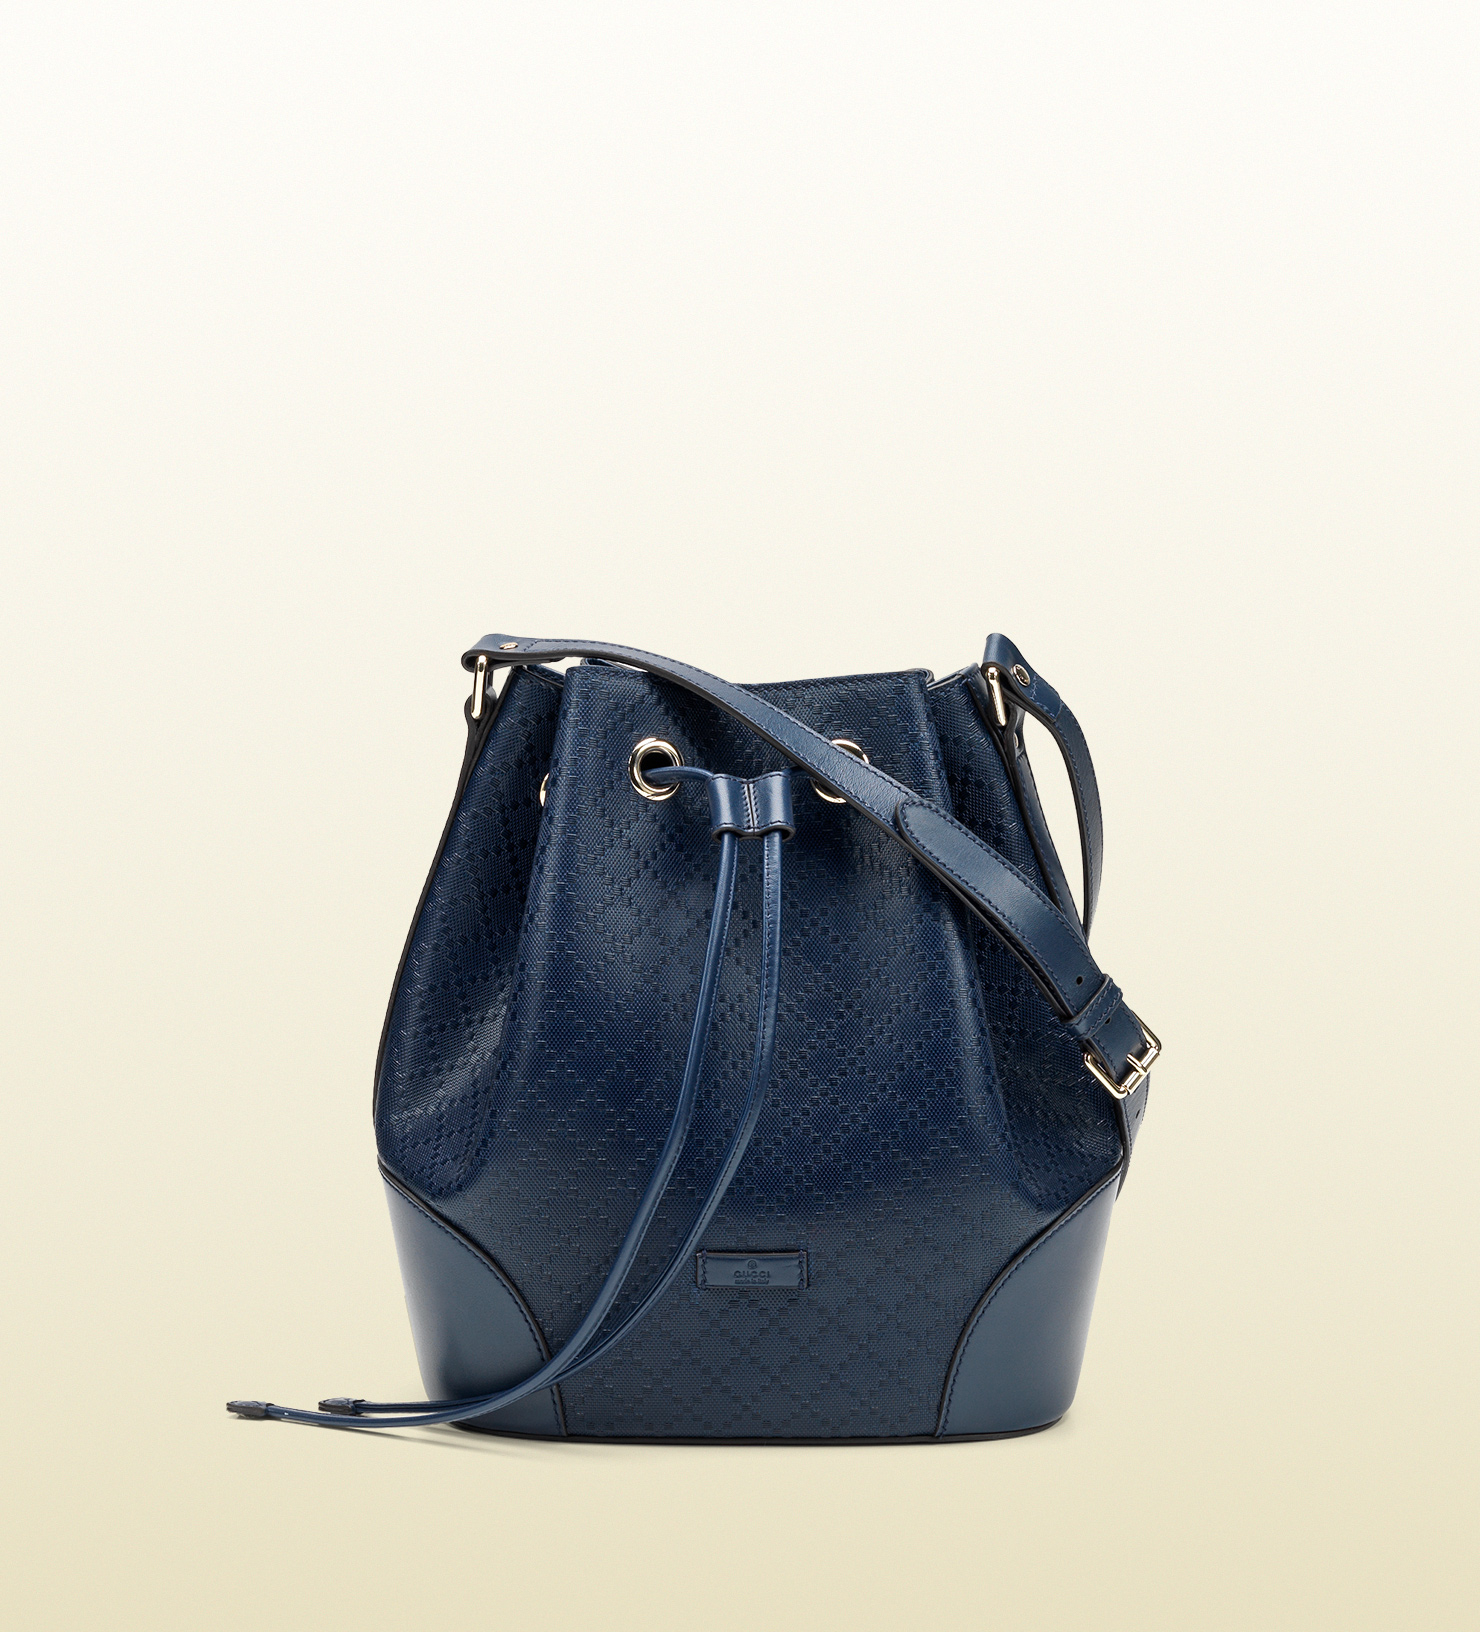 c6d85293c9d5fd Gucci Bright Diamante Leather Bucket Bag in Blue - Lyst